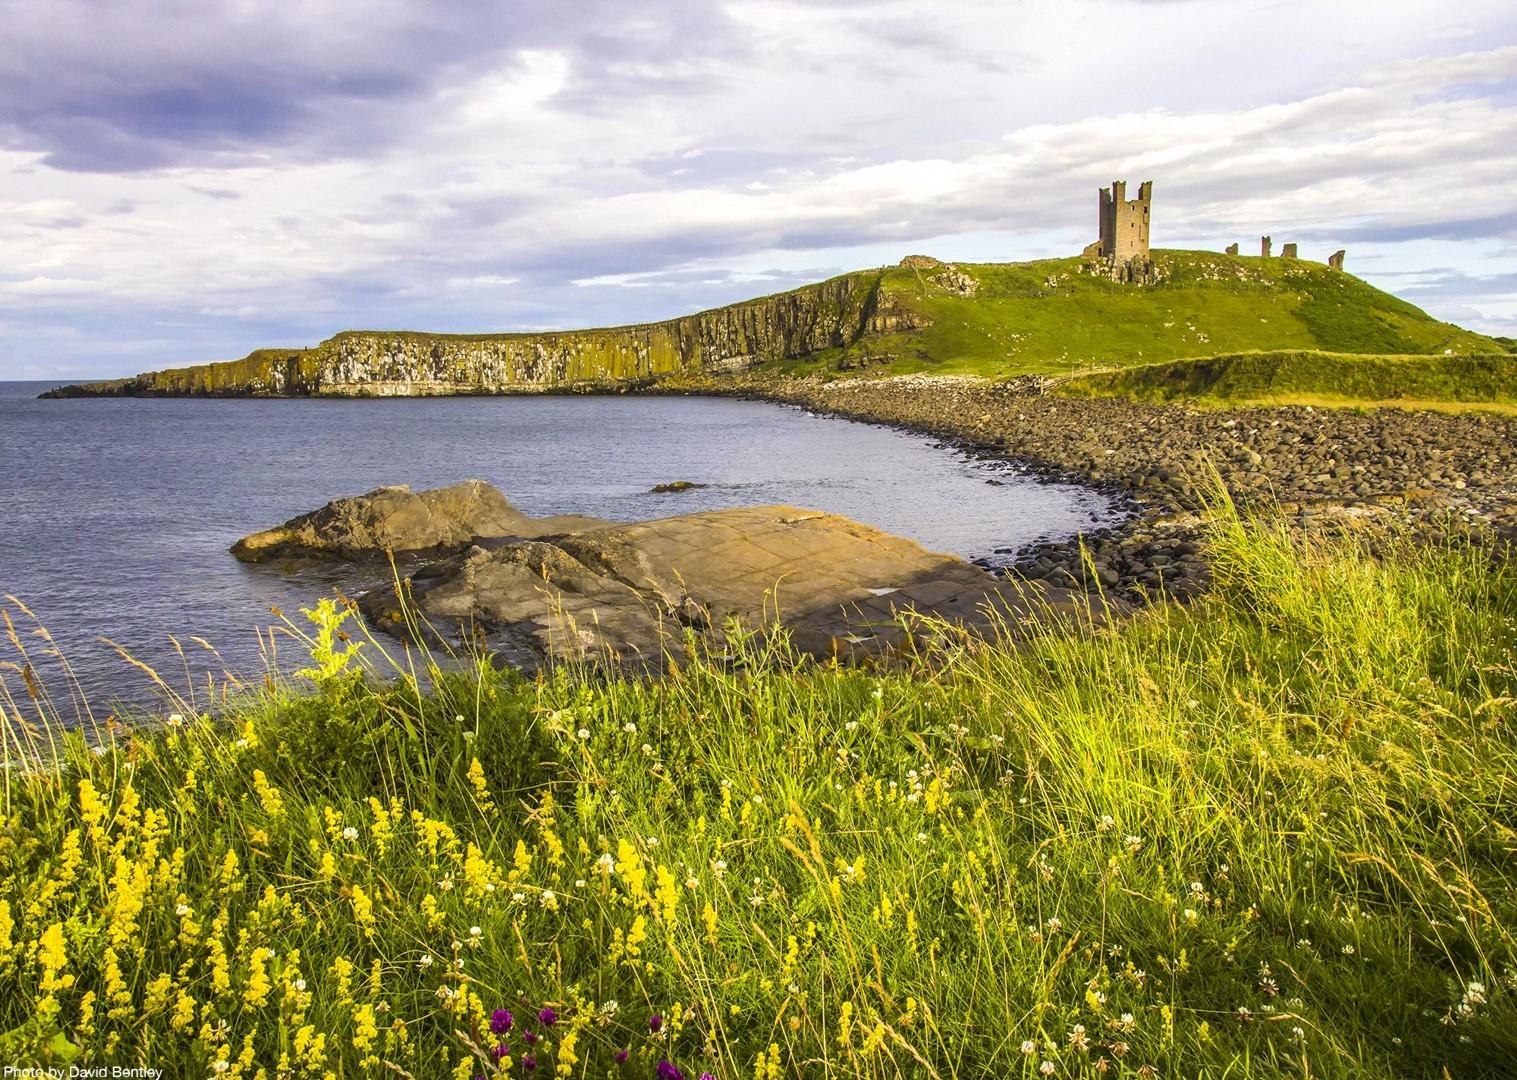 castles-self-guided-2-day-northumberland-coast-holiday-cycling-tour.jpg - UK - Northumberland - Alnmouth - Guided Leisure Cycling Holiday - Leisure Cycling